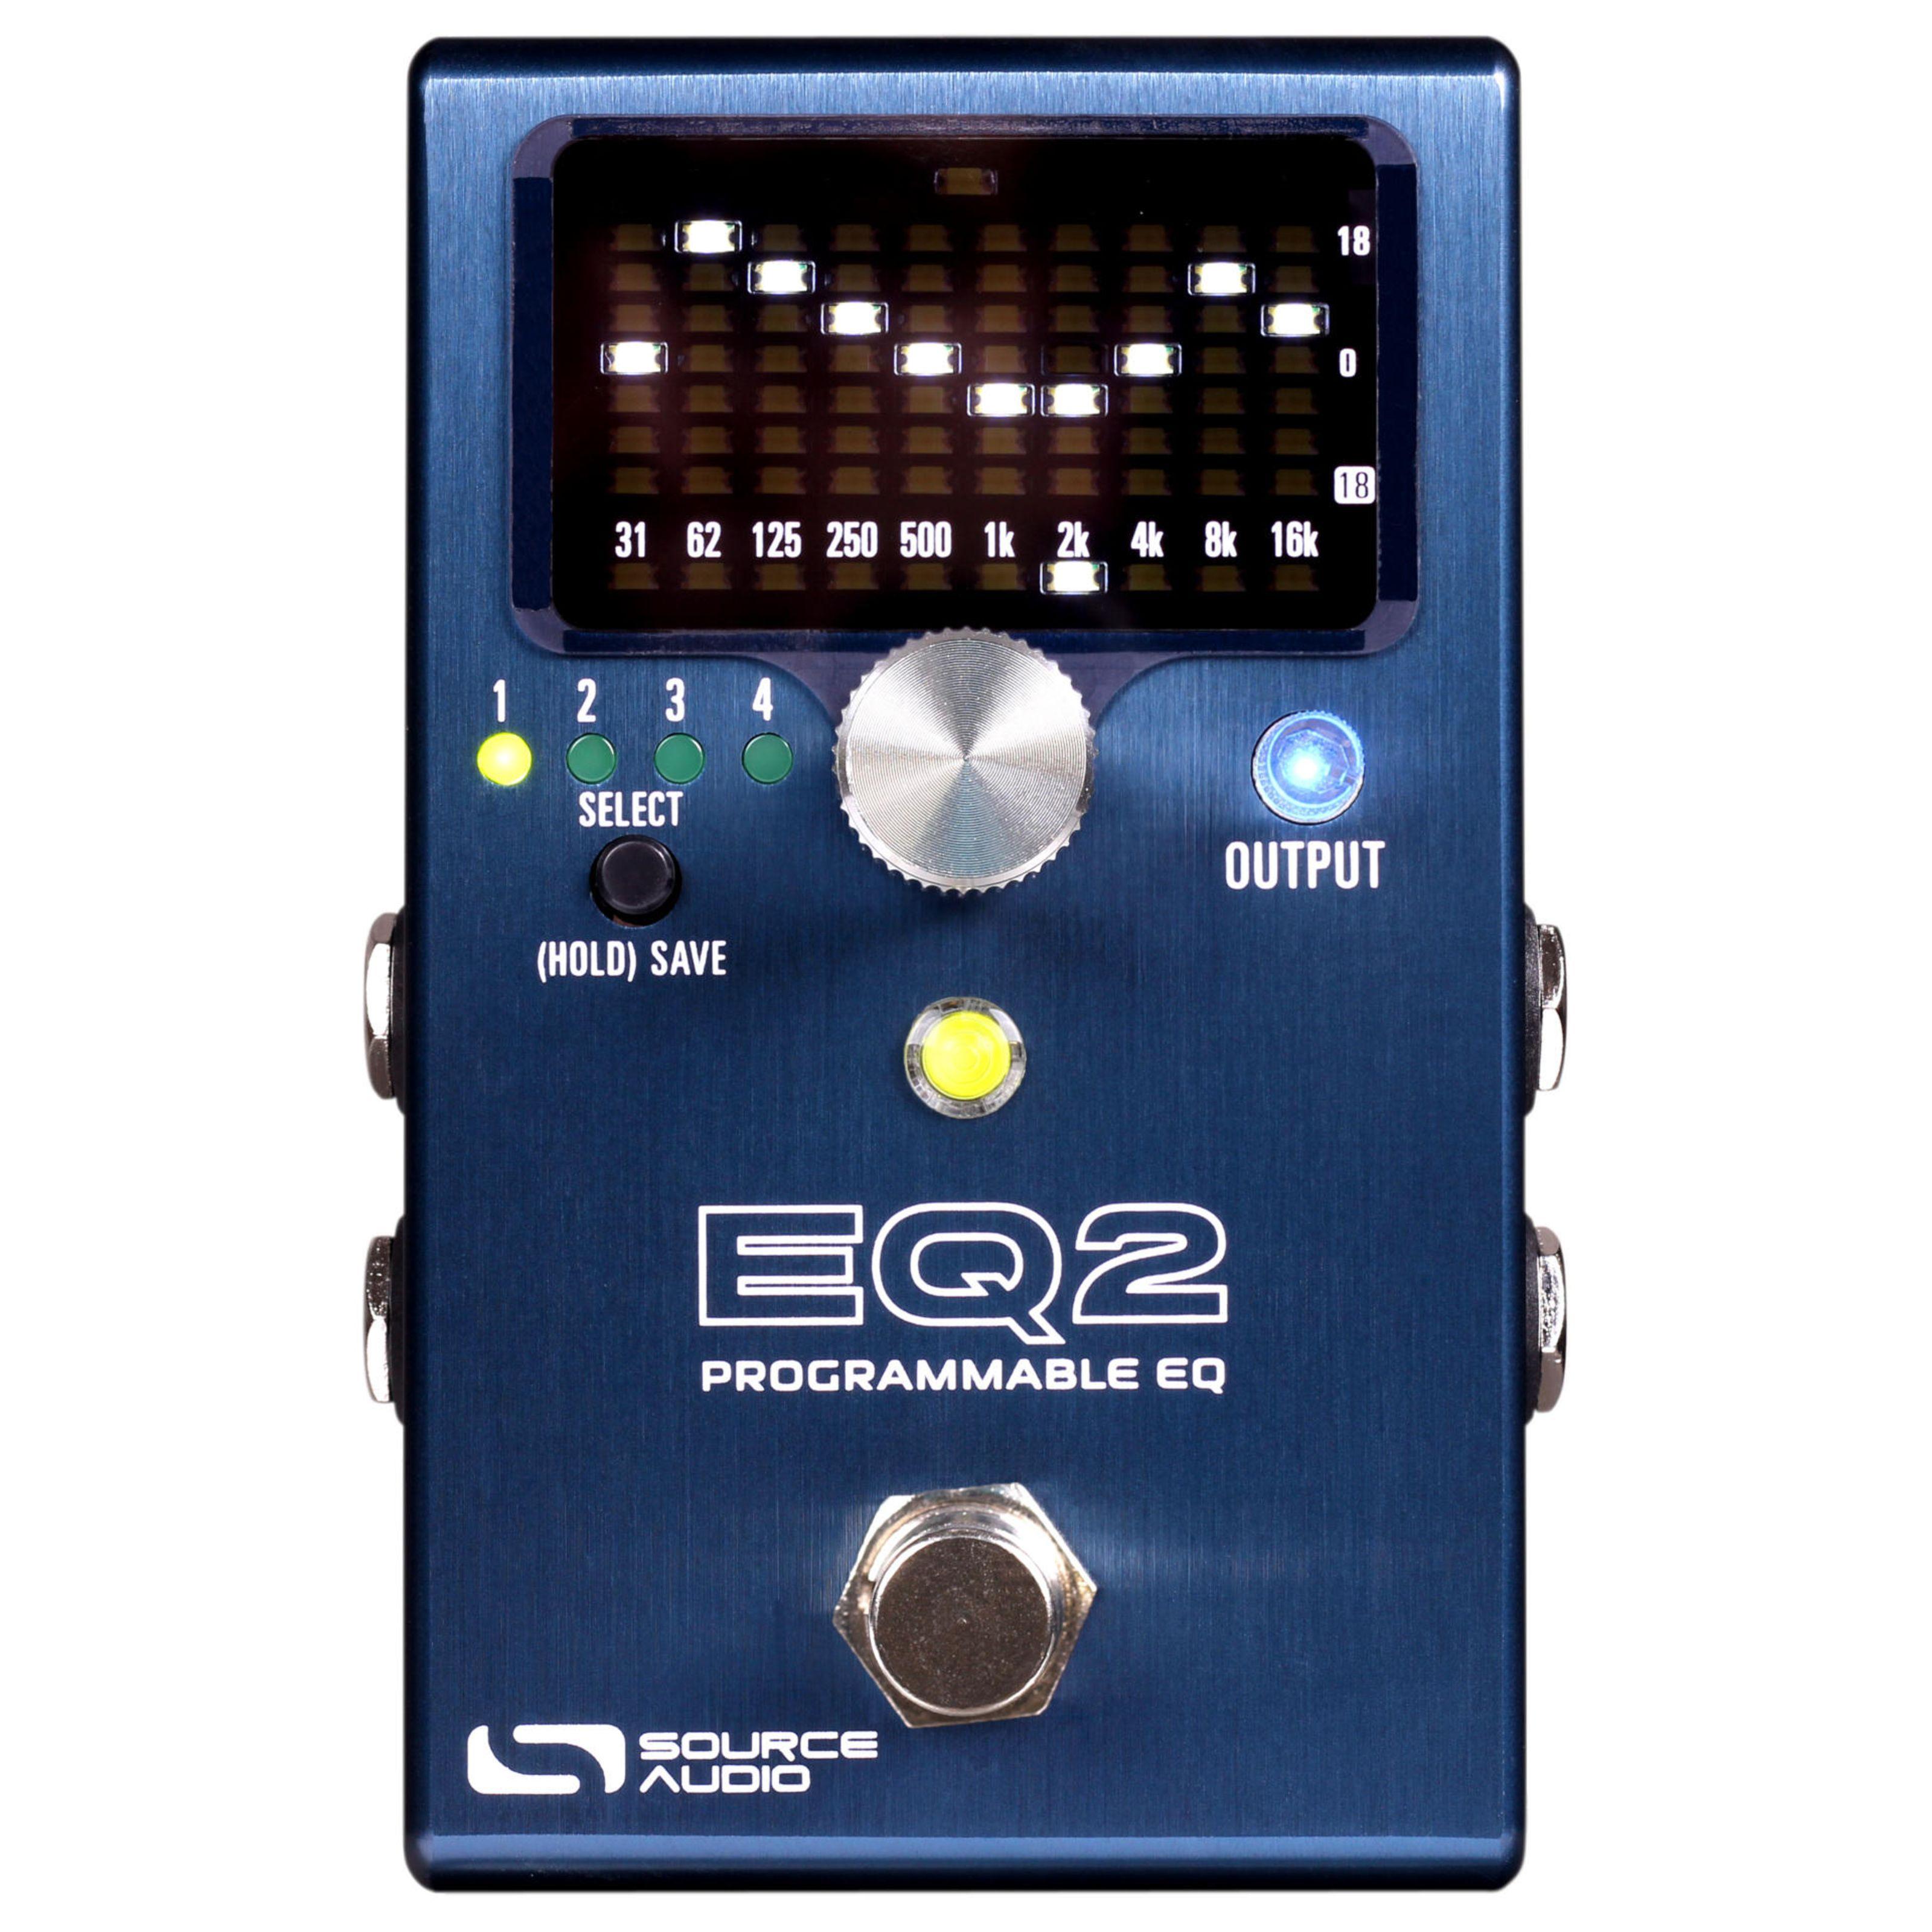 Source Audio - EQ2 SR SA 270 OS EQ2